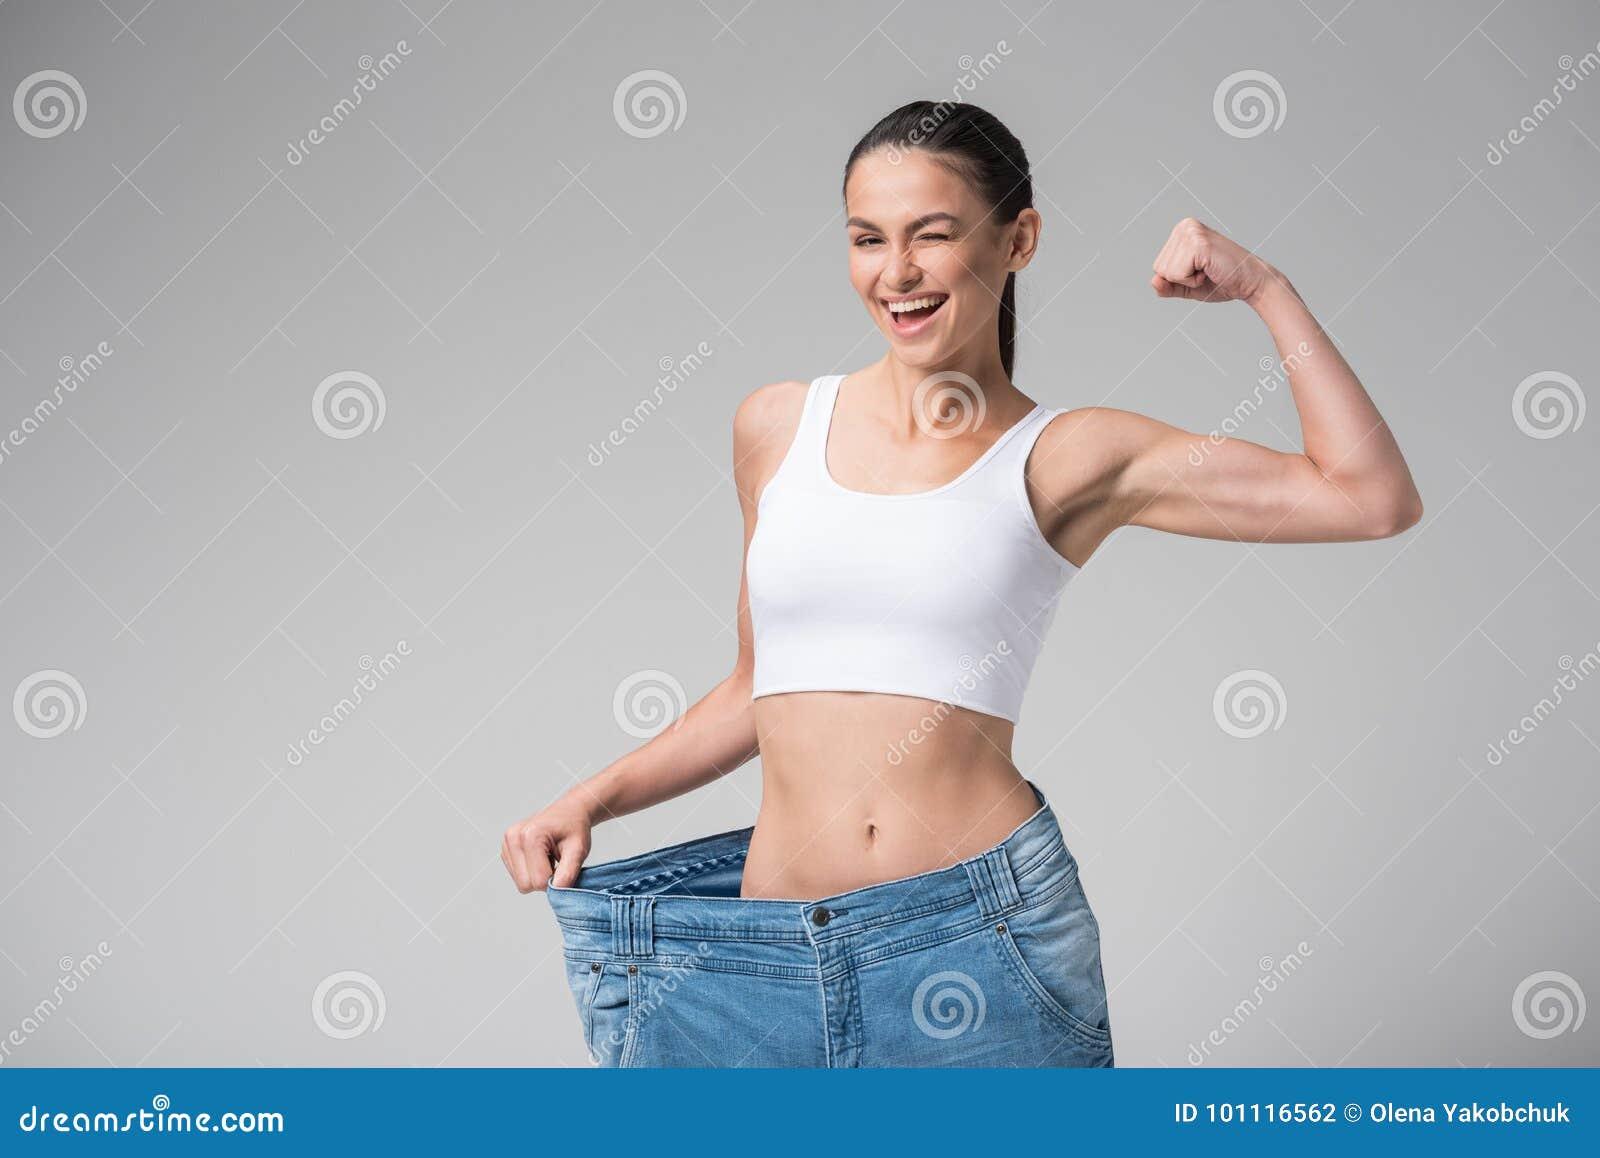 Sexilicious skinny teen showig her